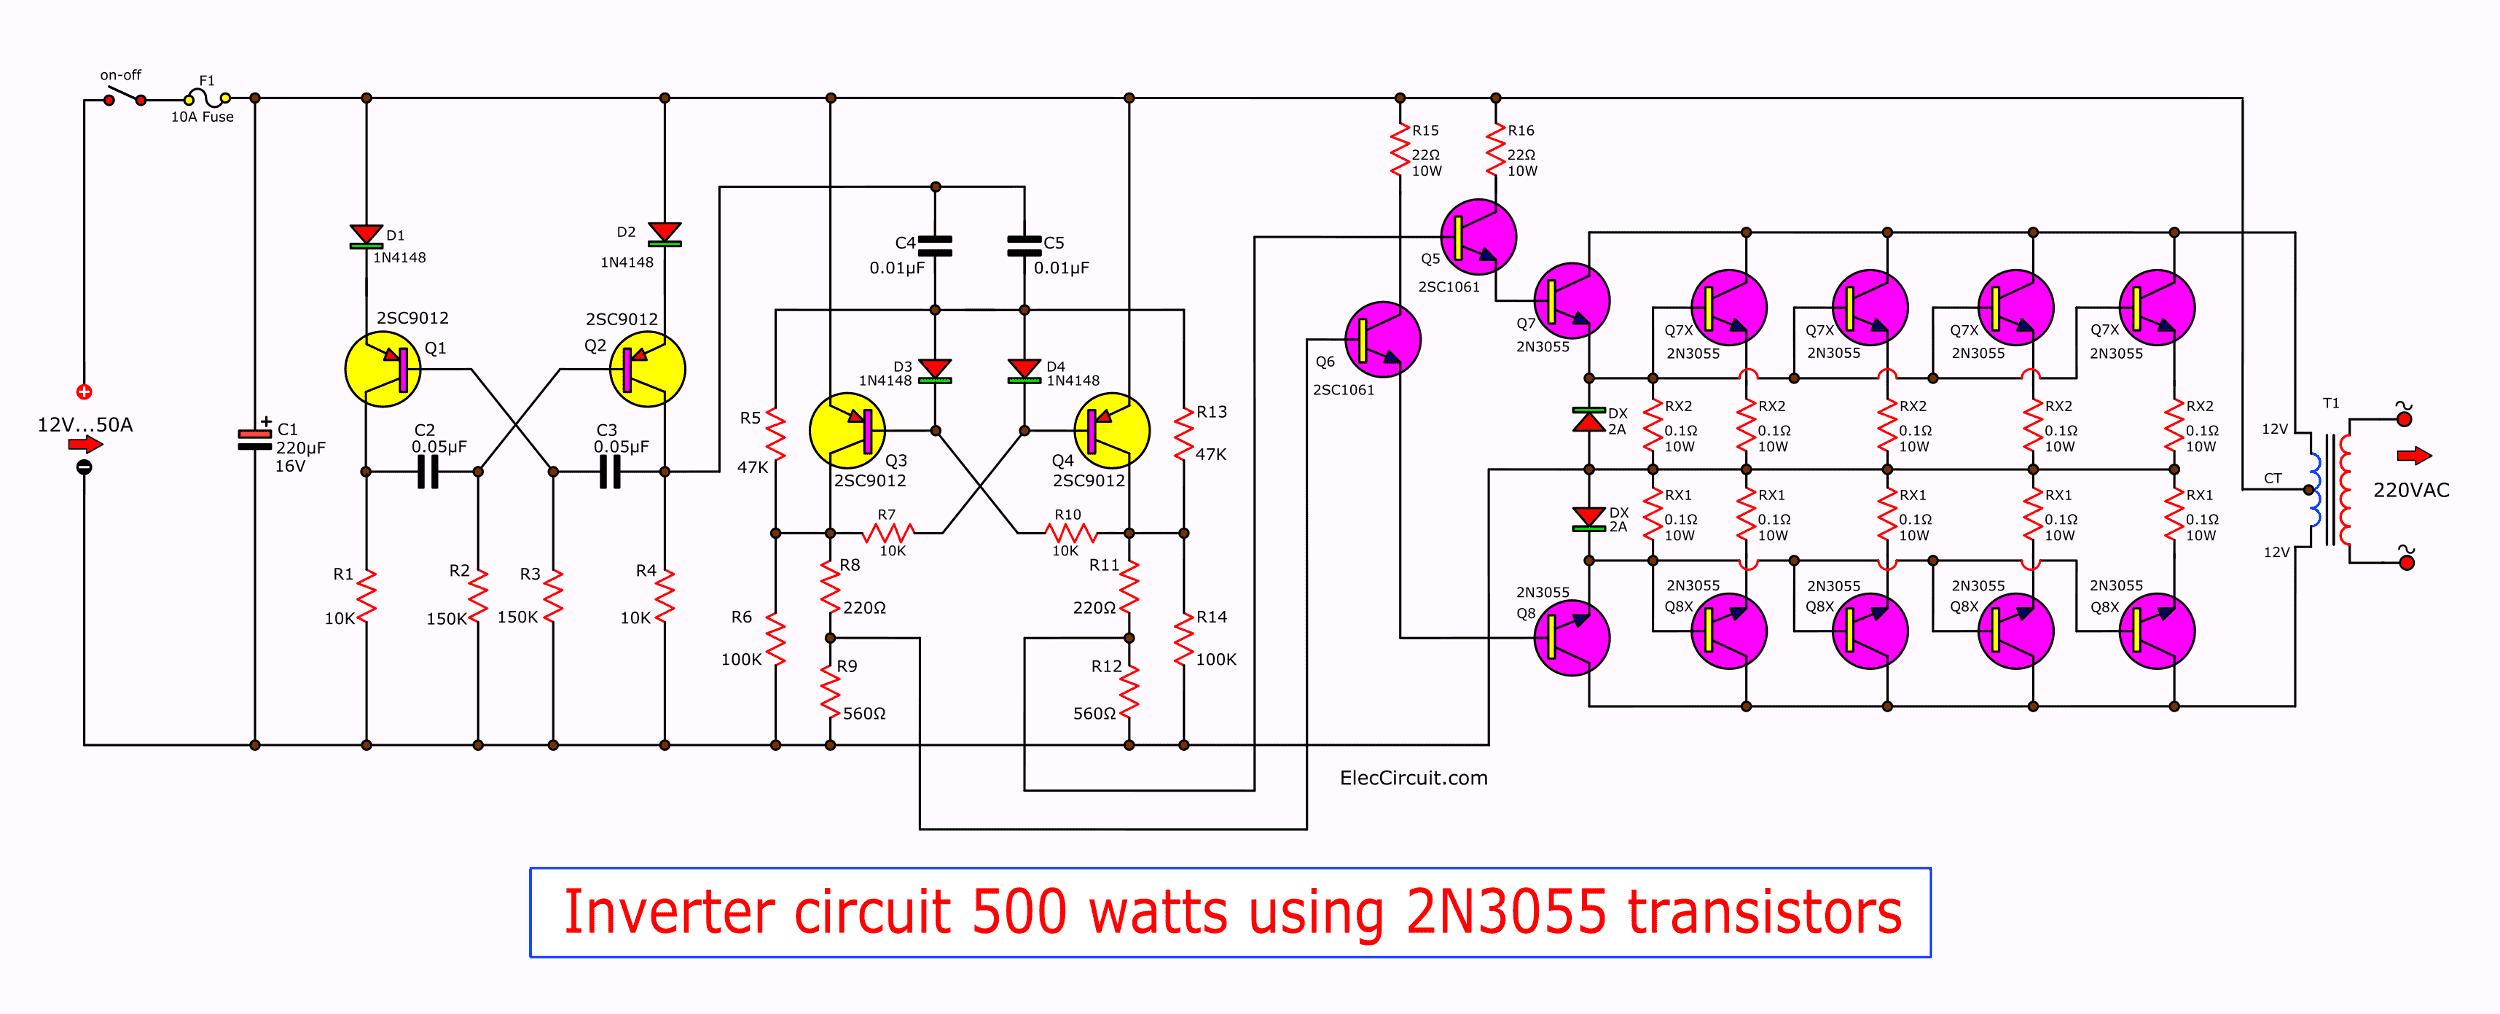 watt inverter circuit diagram on 500 watt power inverter circuit